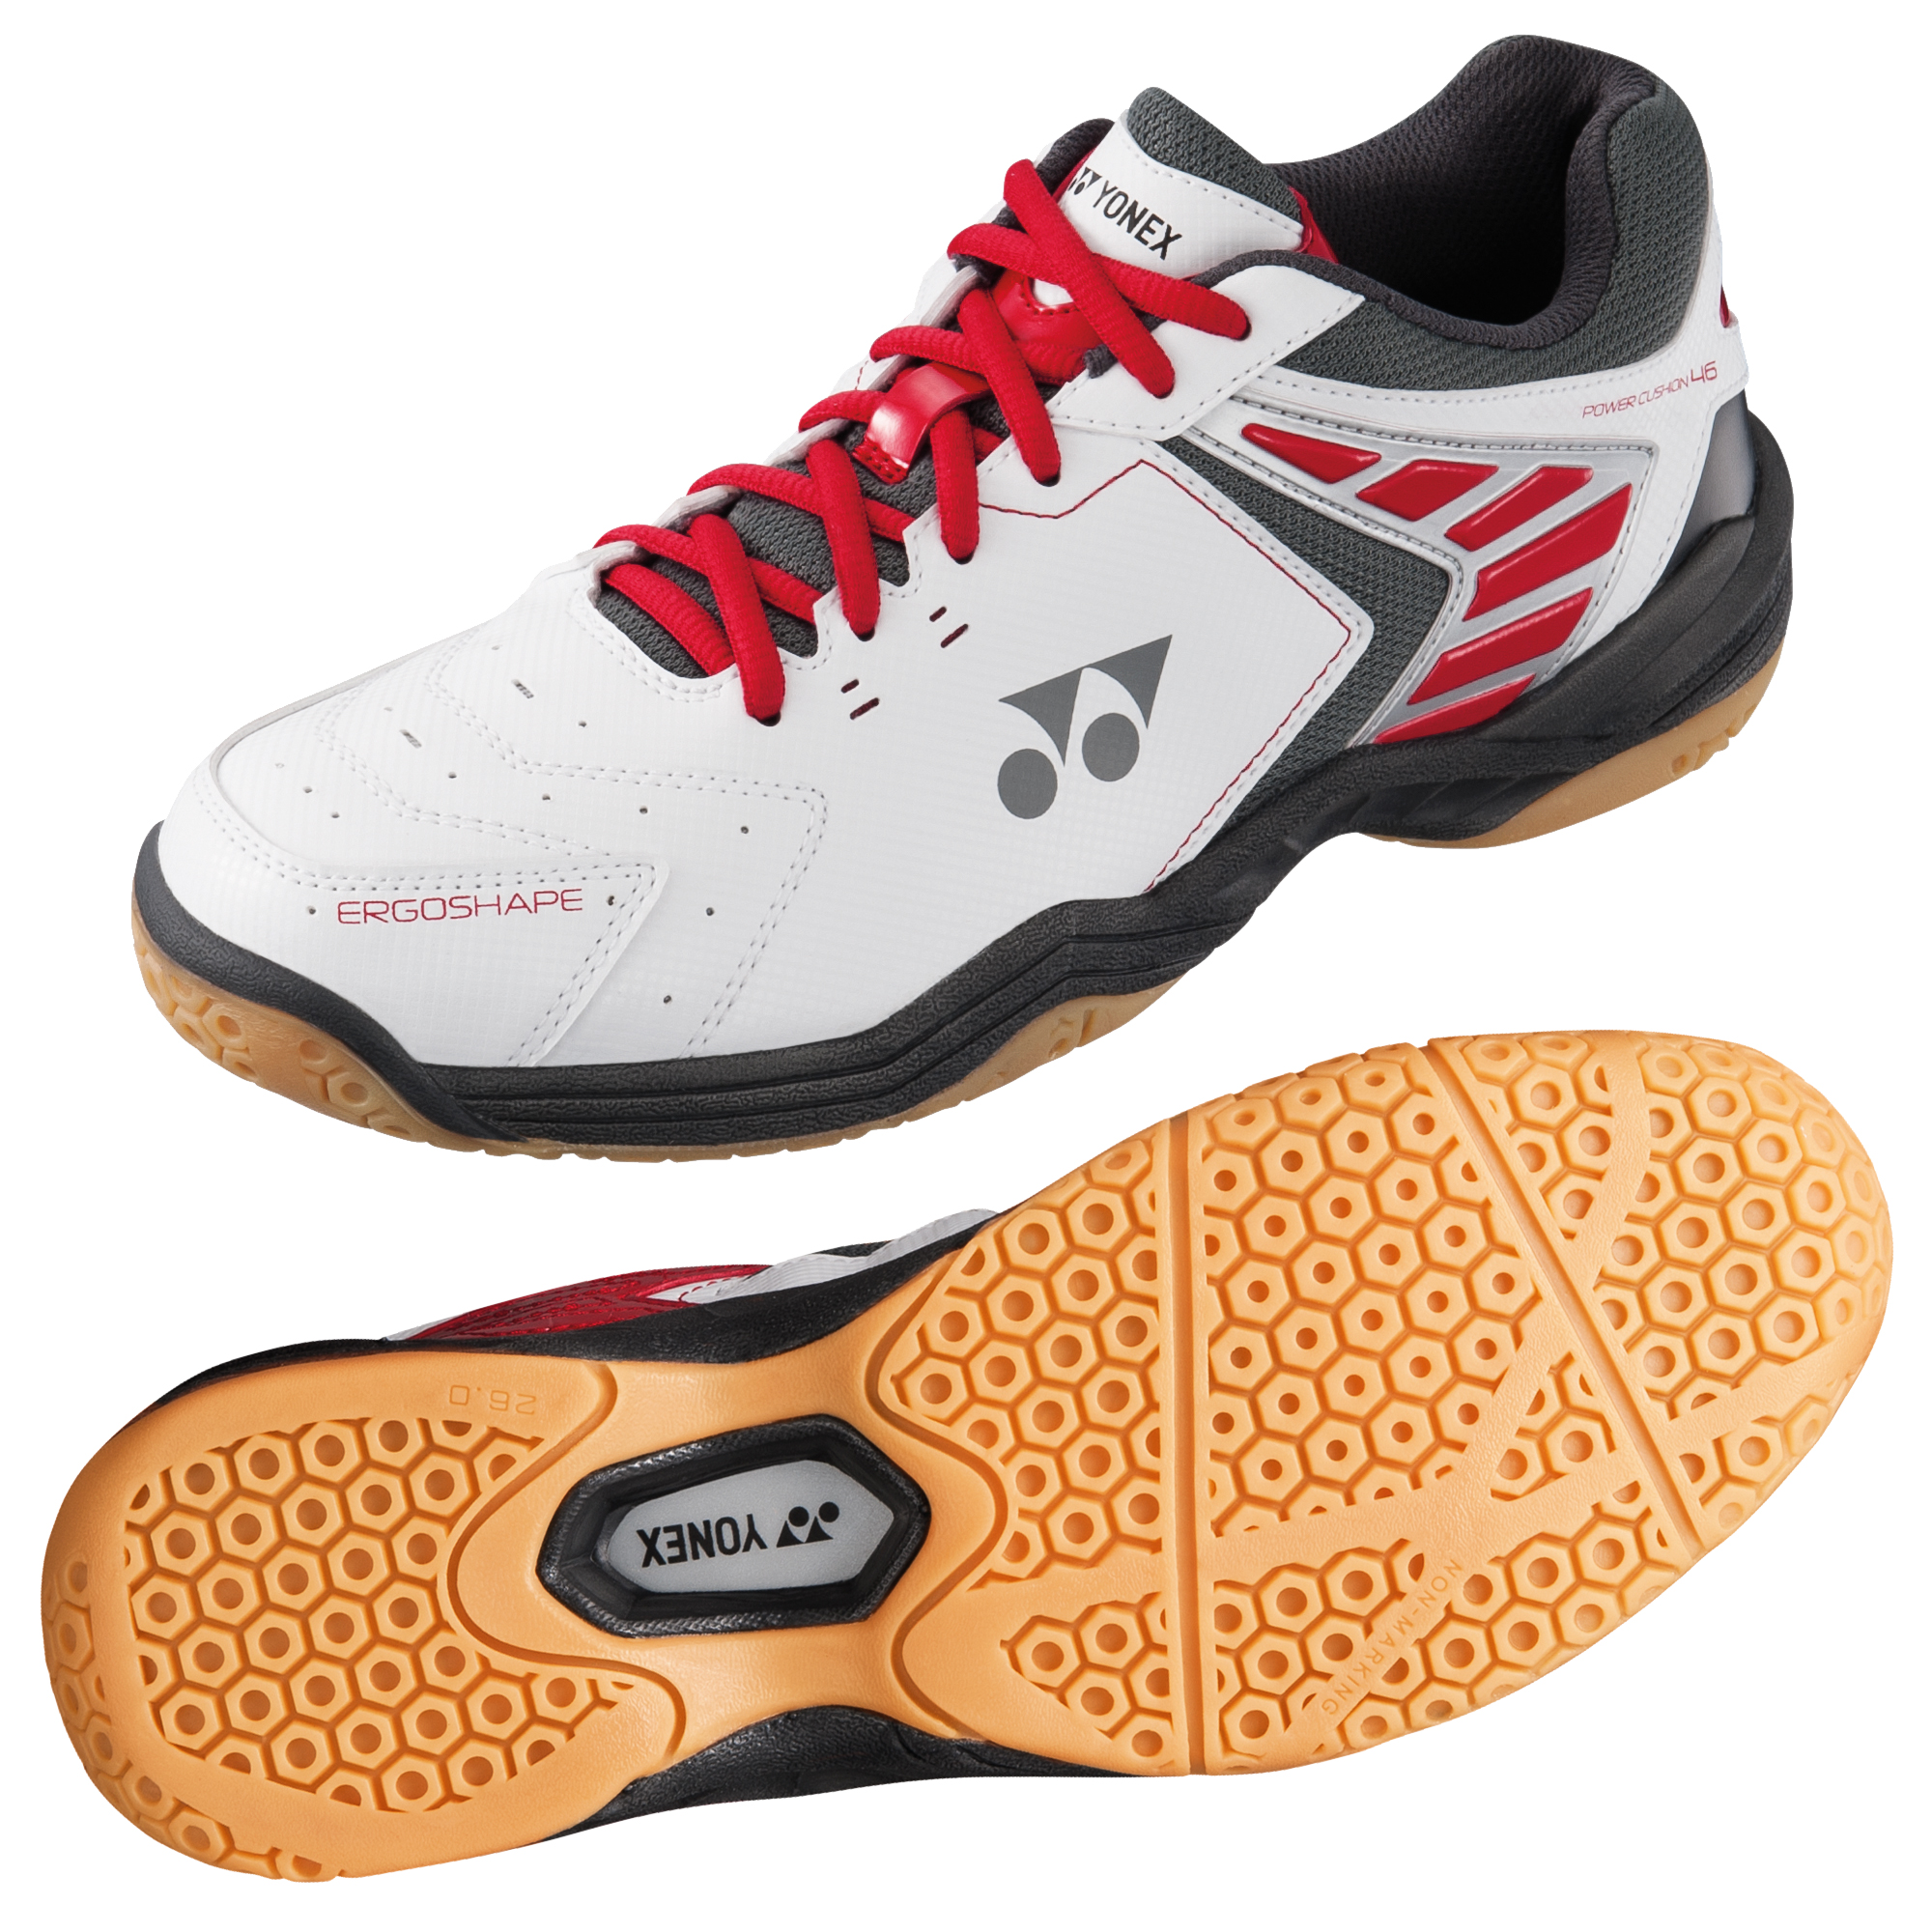 Yonex Power Cushion 46 Mens Badminton Shoes  10.5 UK